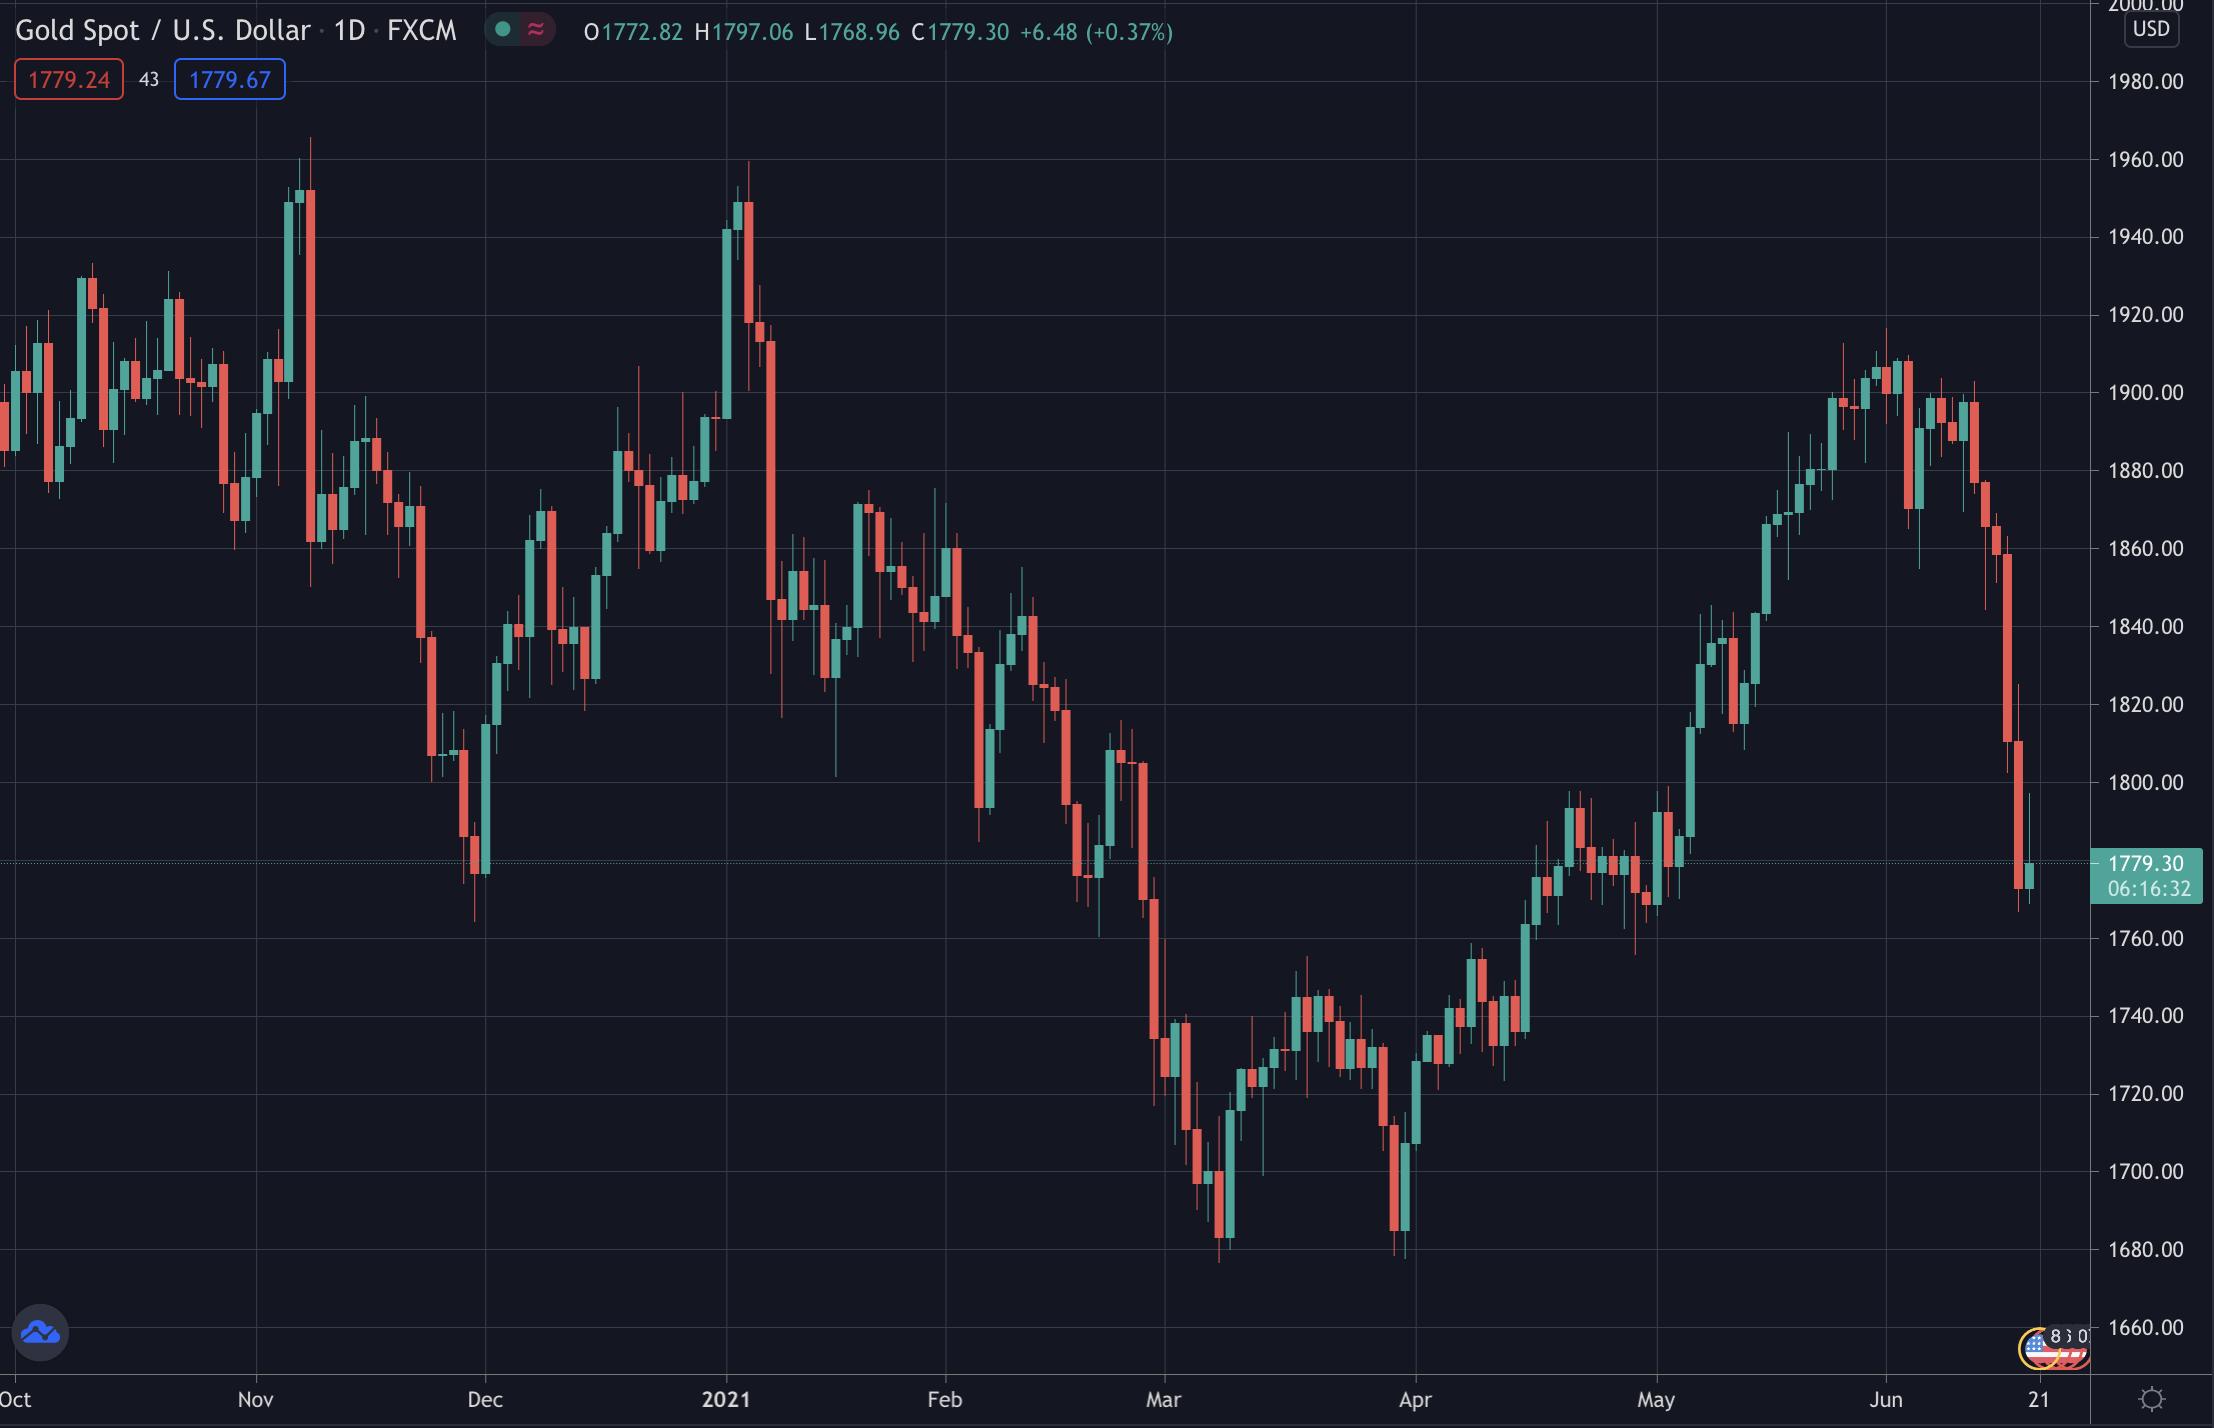 Gold's price XAU/USD on Tradingview, June 2021